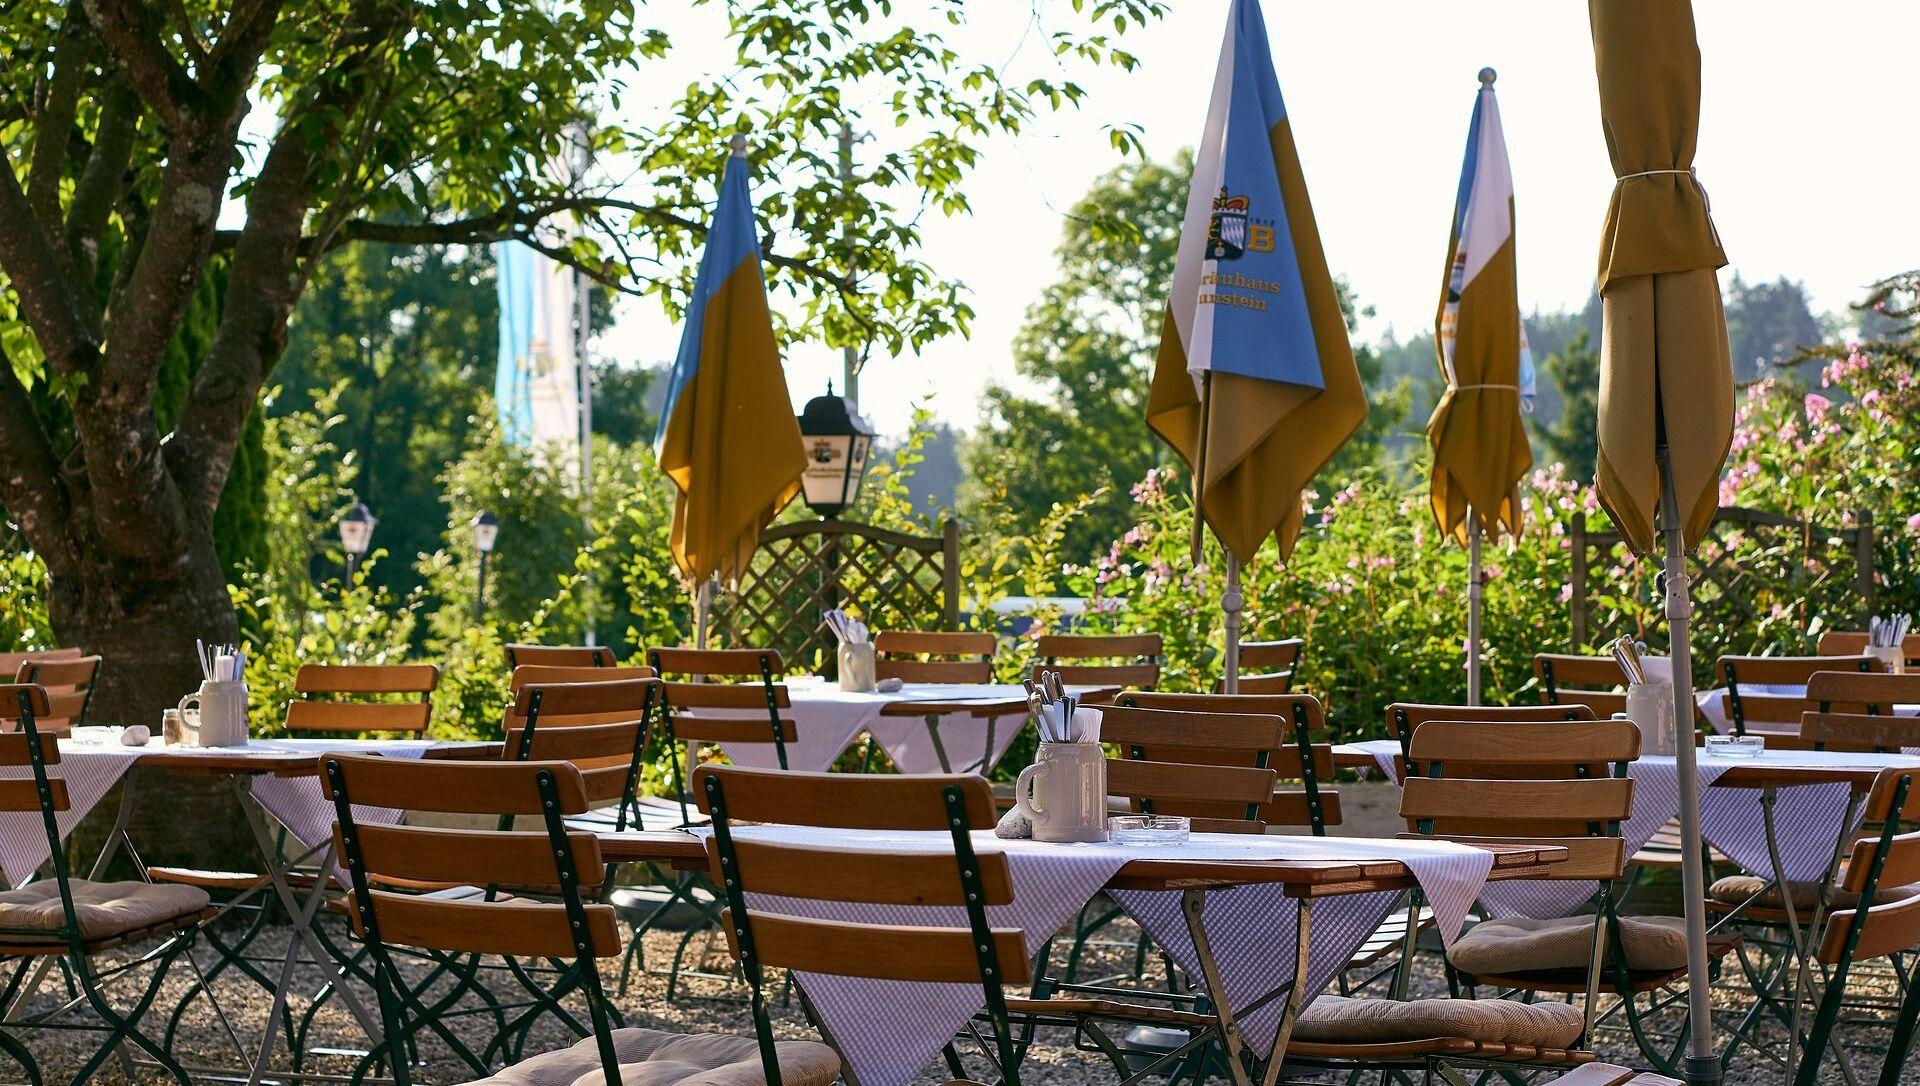 Terrasse d'un restaurant - Sputnik France, 1920, 16.08.2021